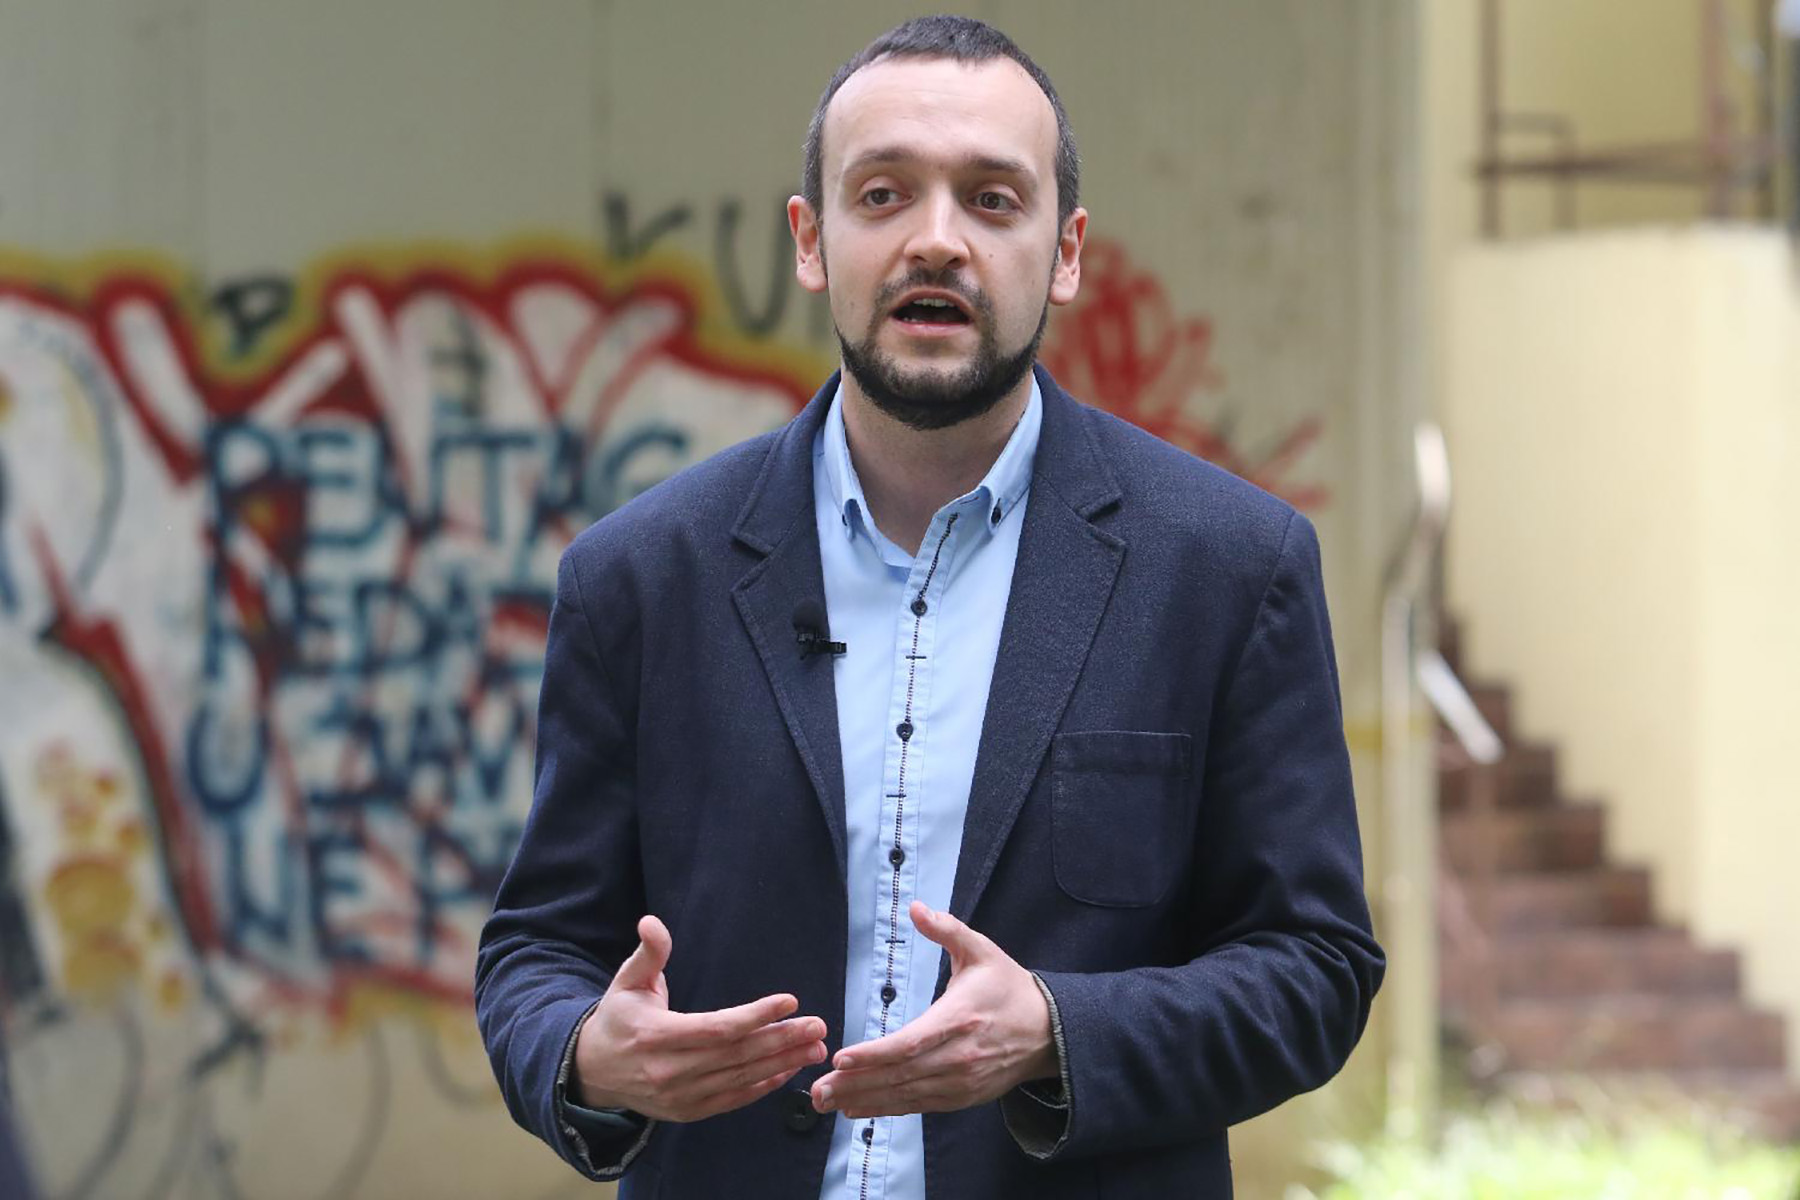 Boban Stojanovic